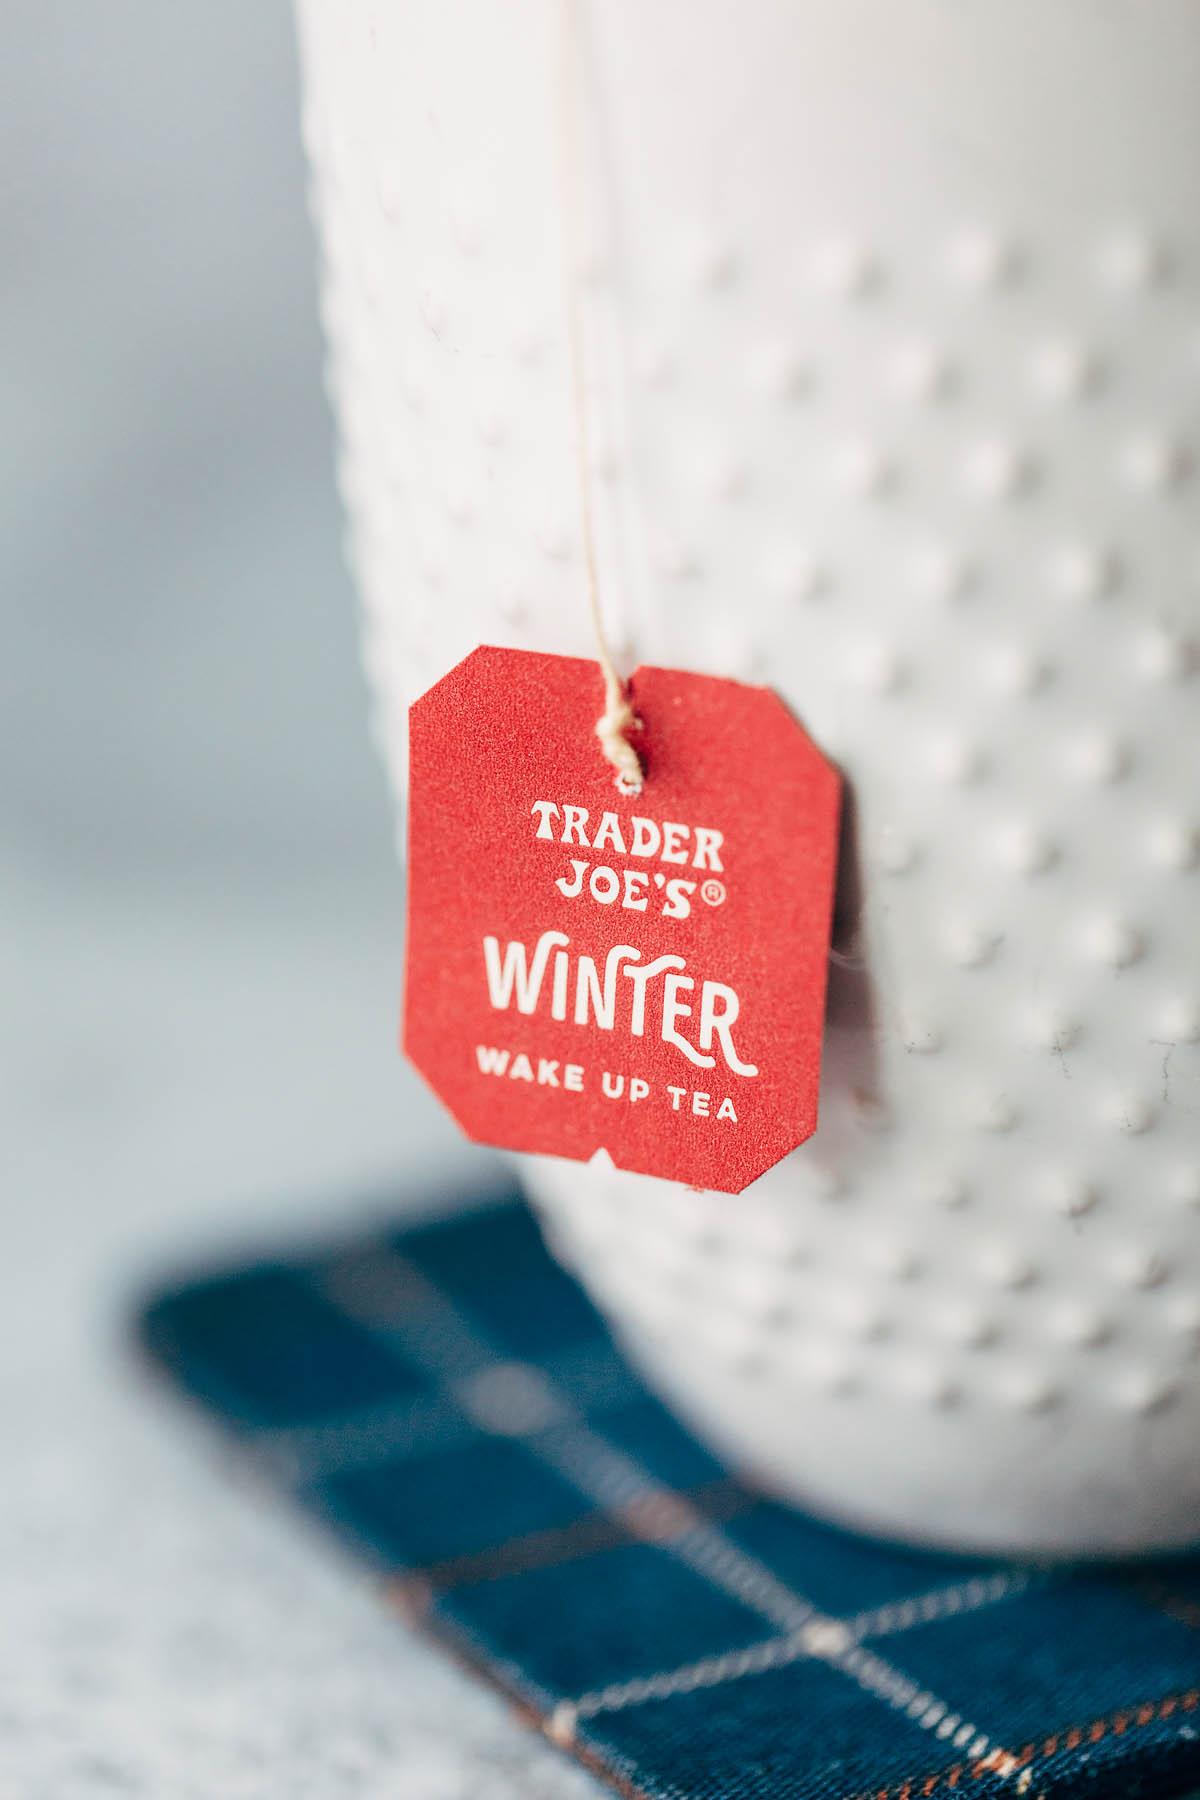 trader joes winter tea label